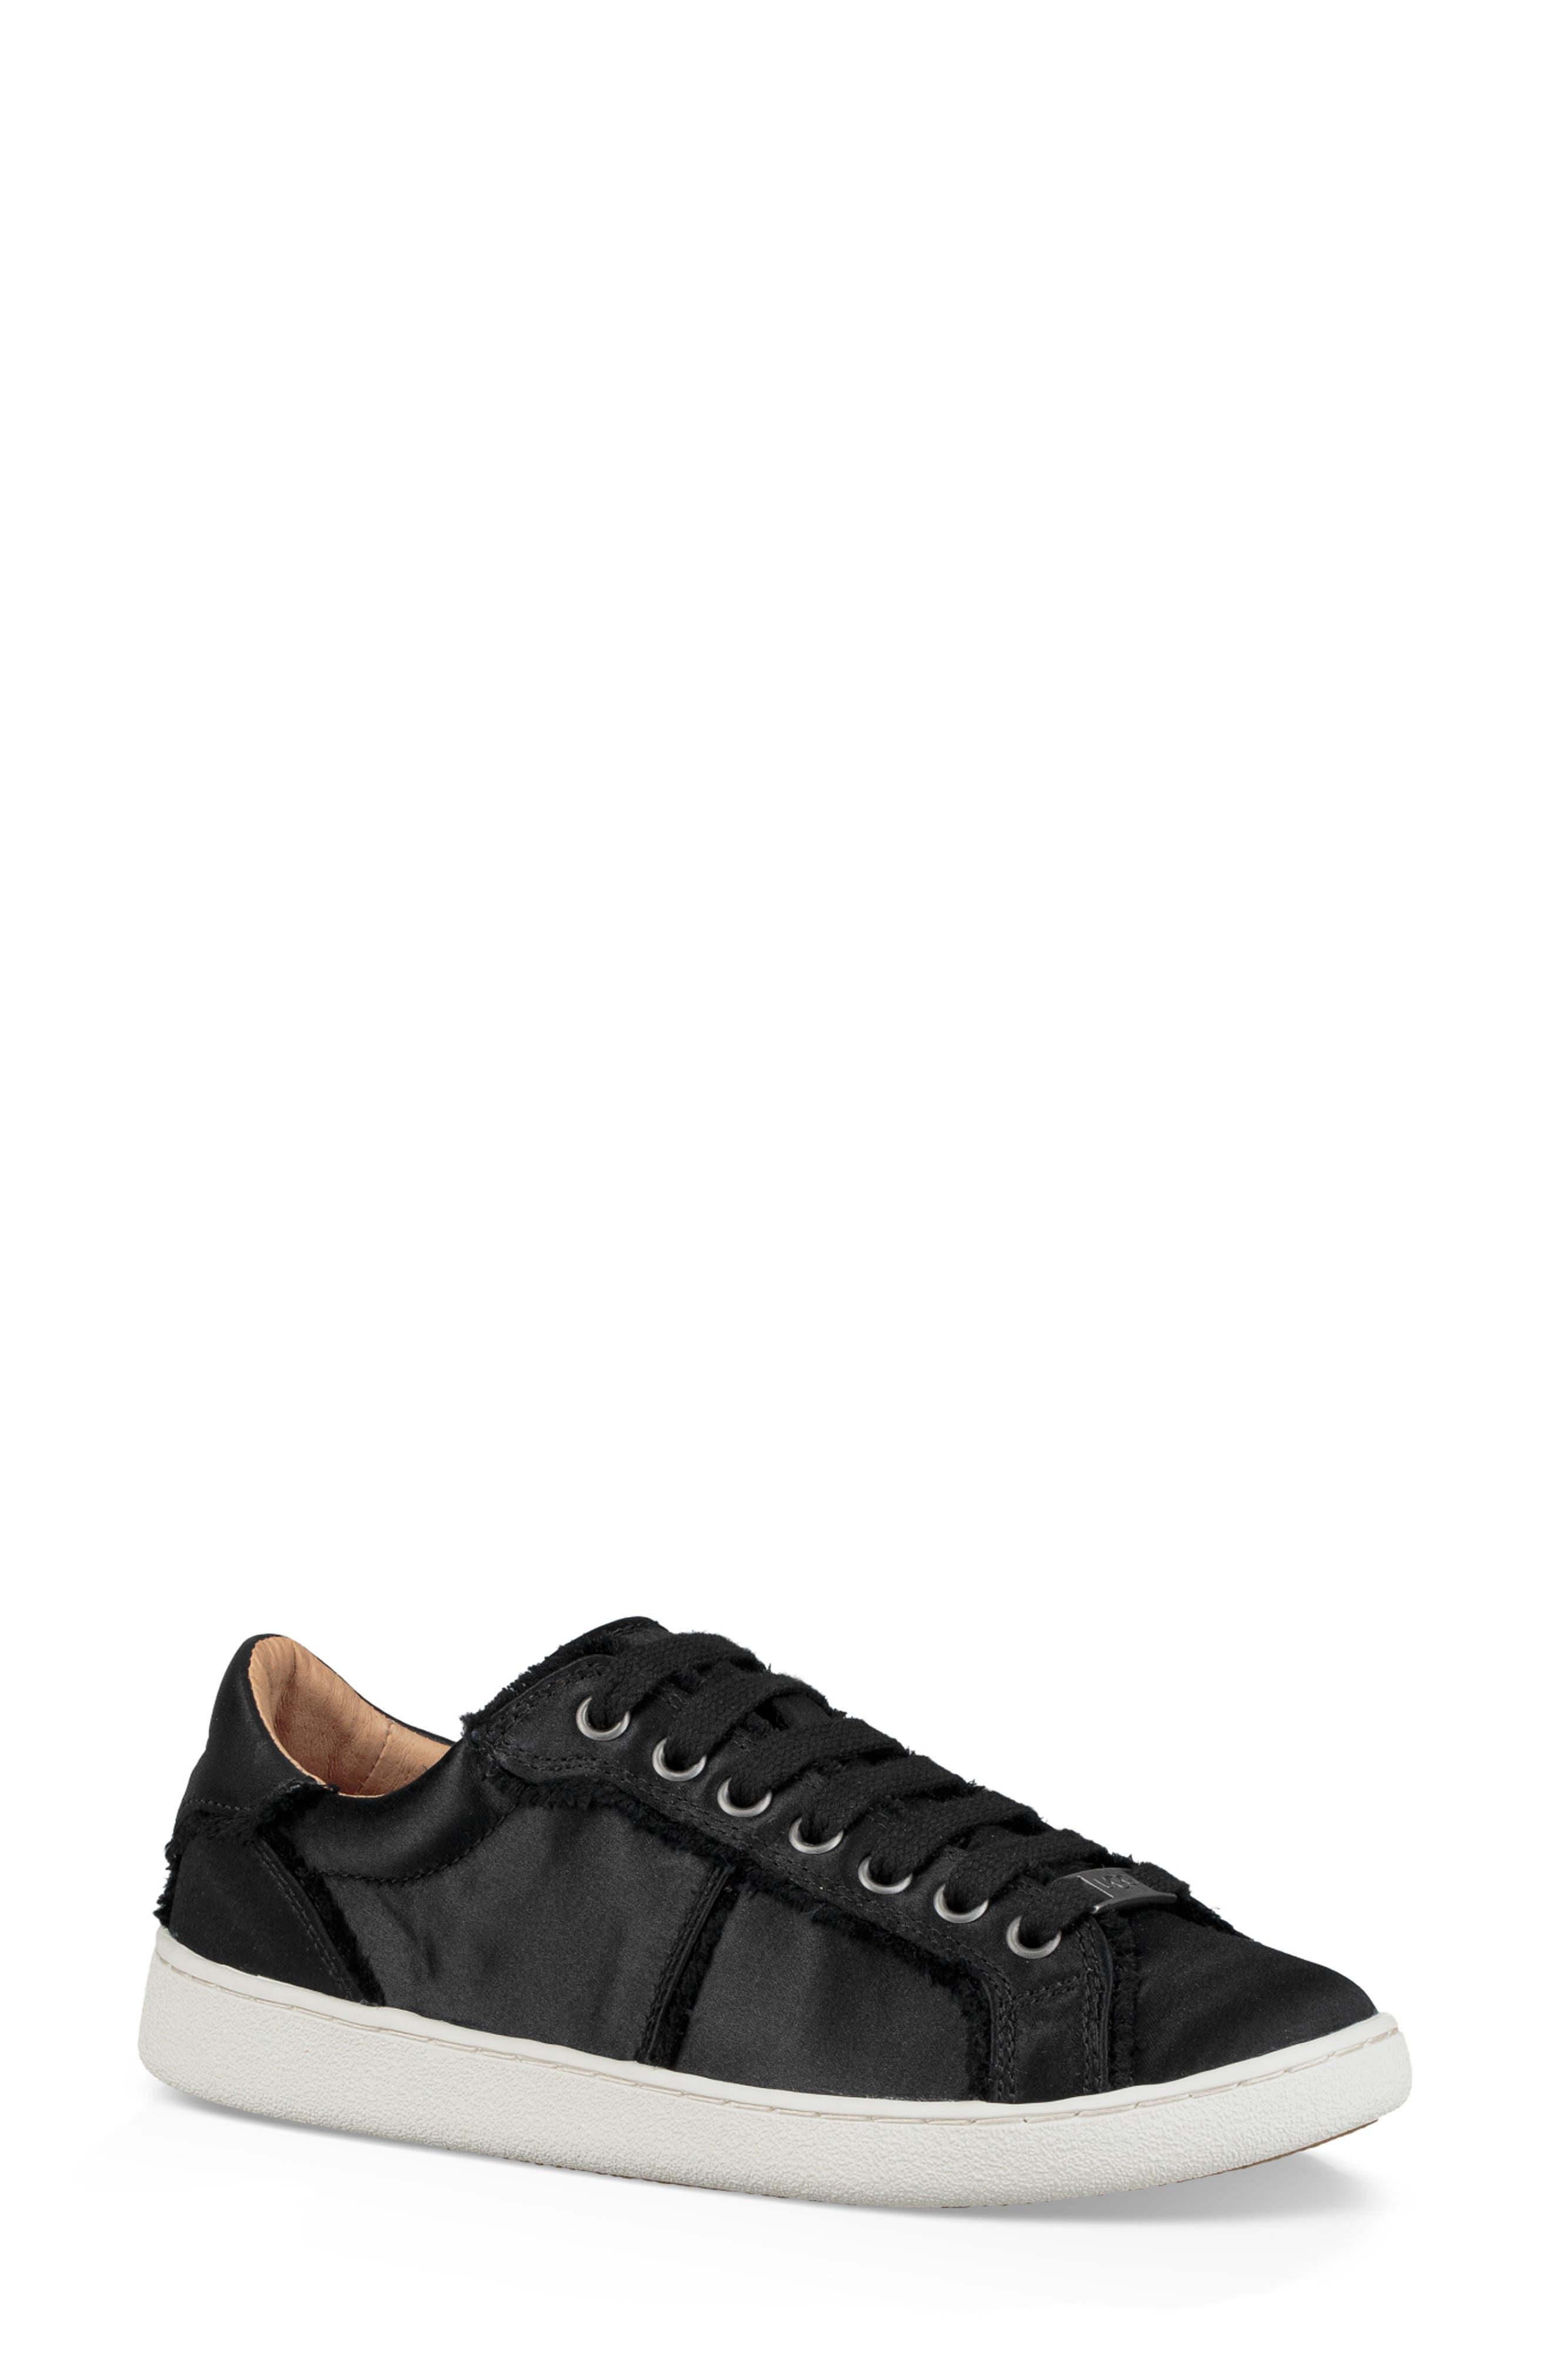 Milo Spill Seam Sneaker,                             Main thumbnail 1, color,                             BLACK FABRIC